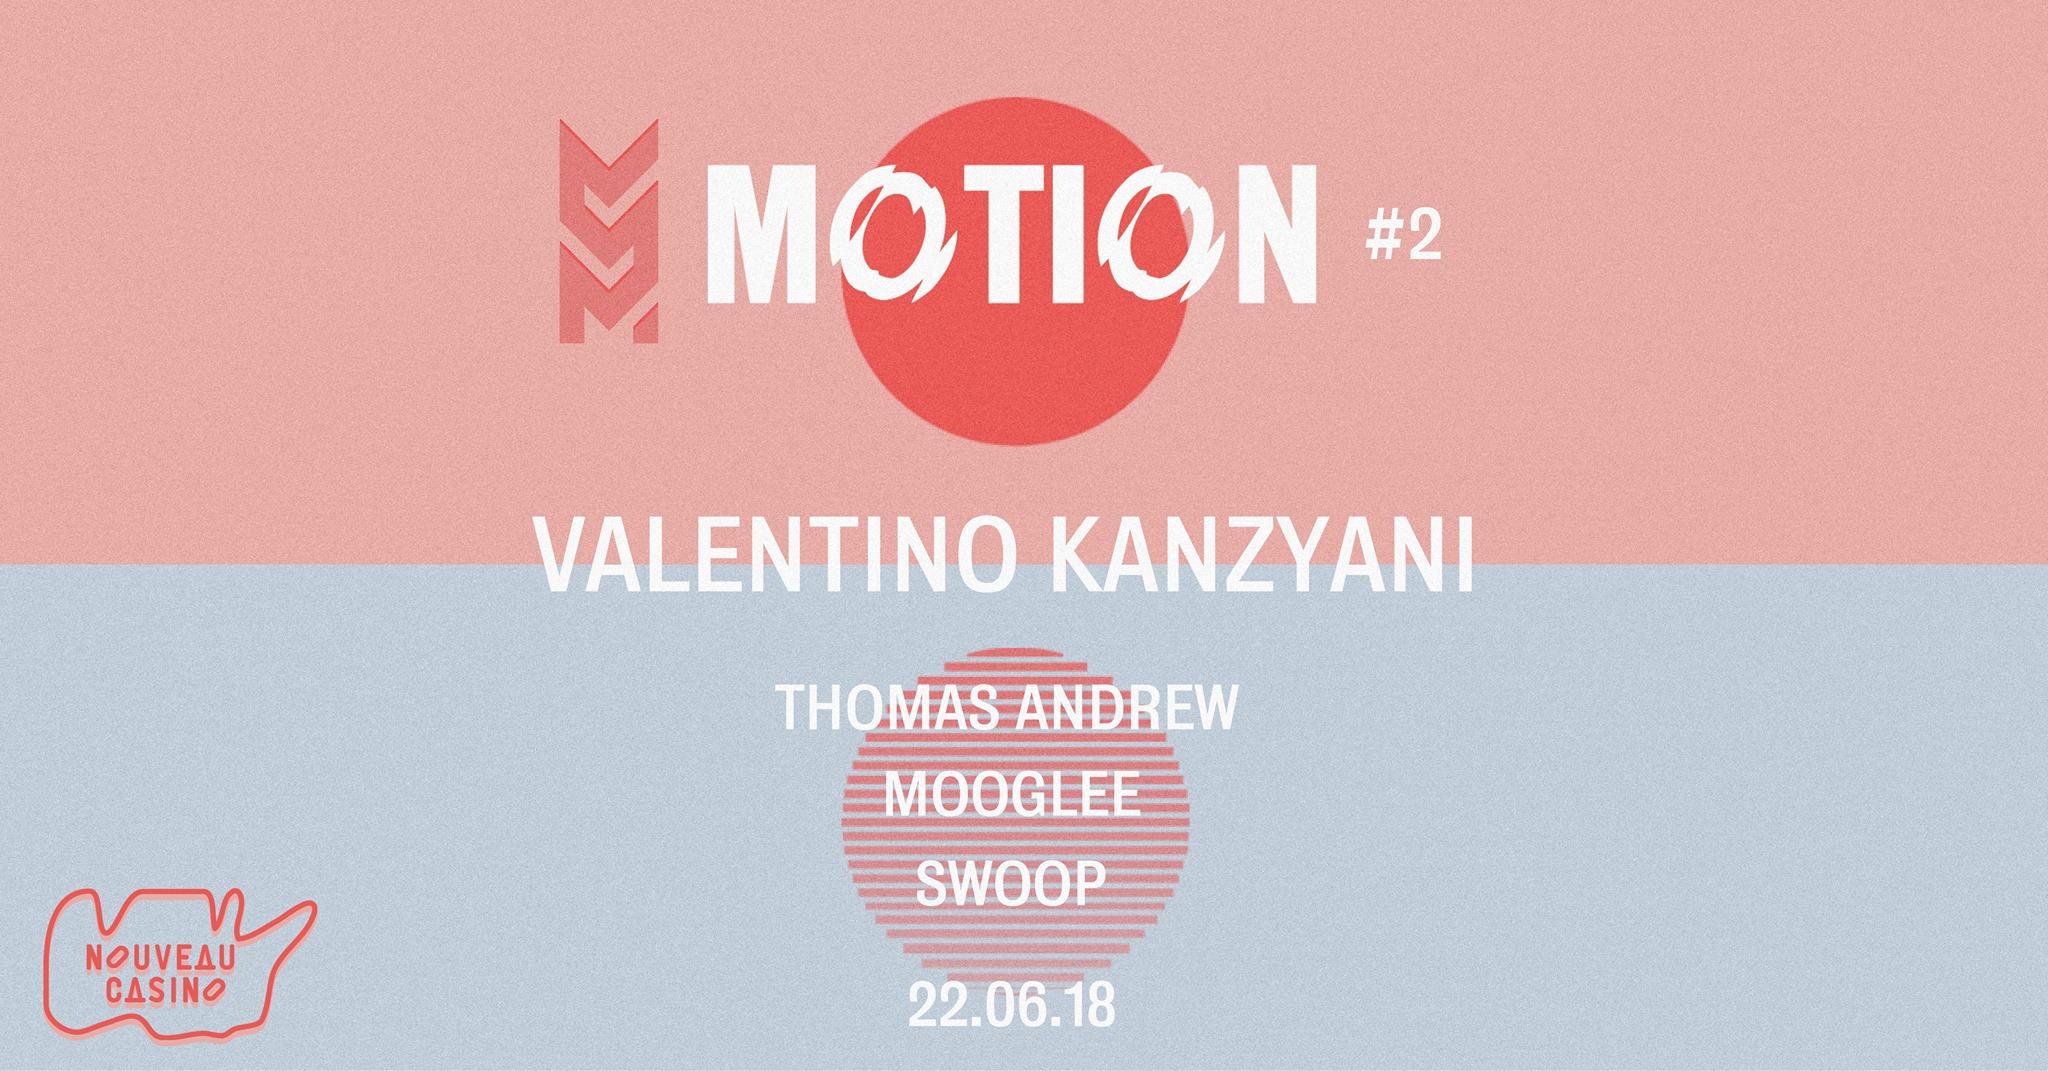 Motion #2 w/ Valentino Kanzyani, Thomas Andrew, Mooglee, Swoop